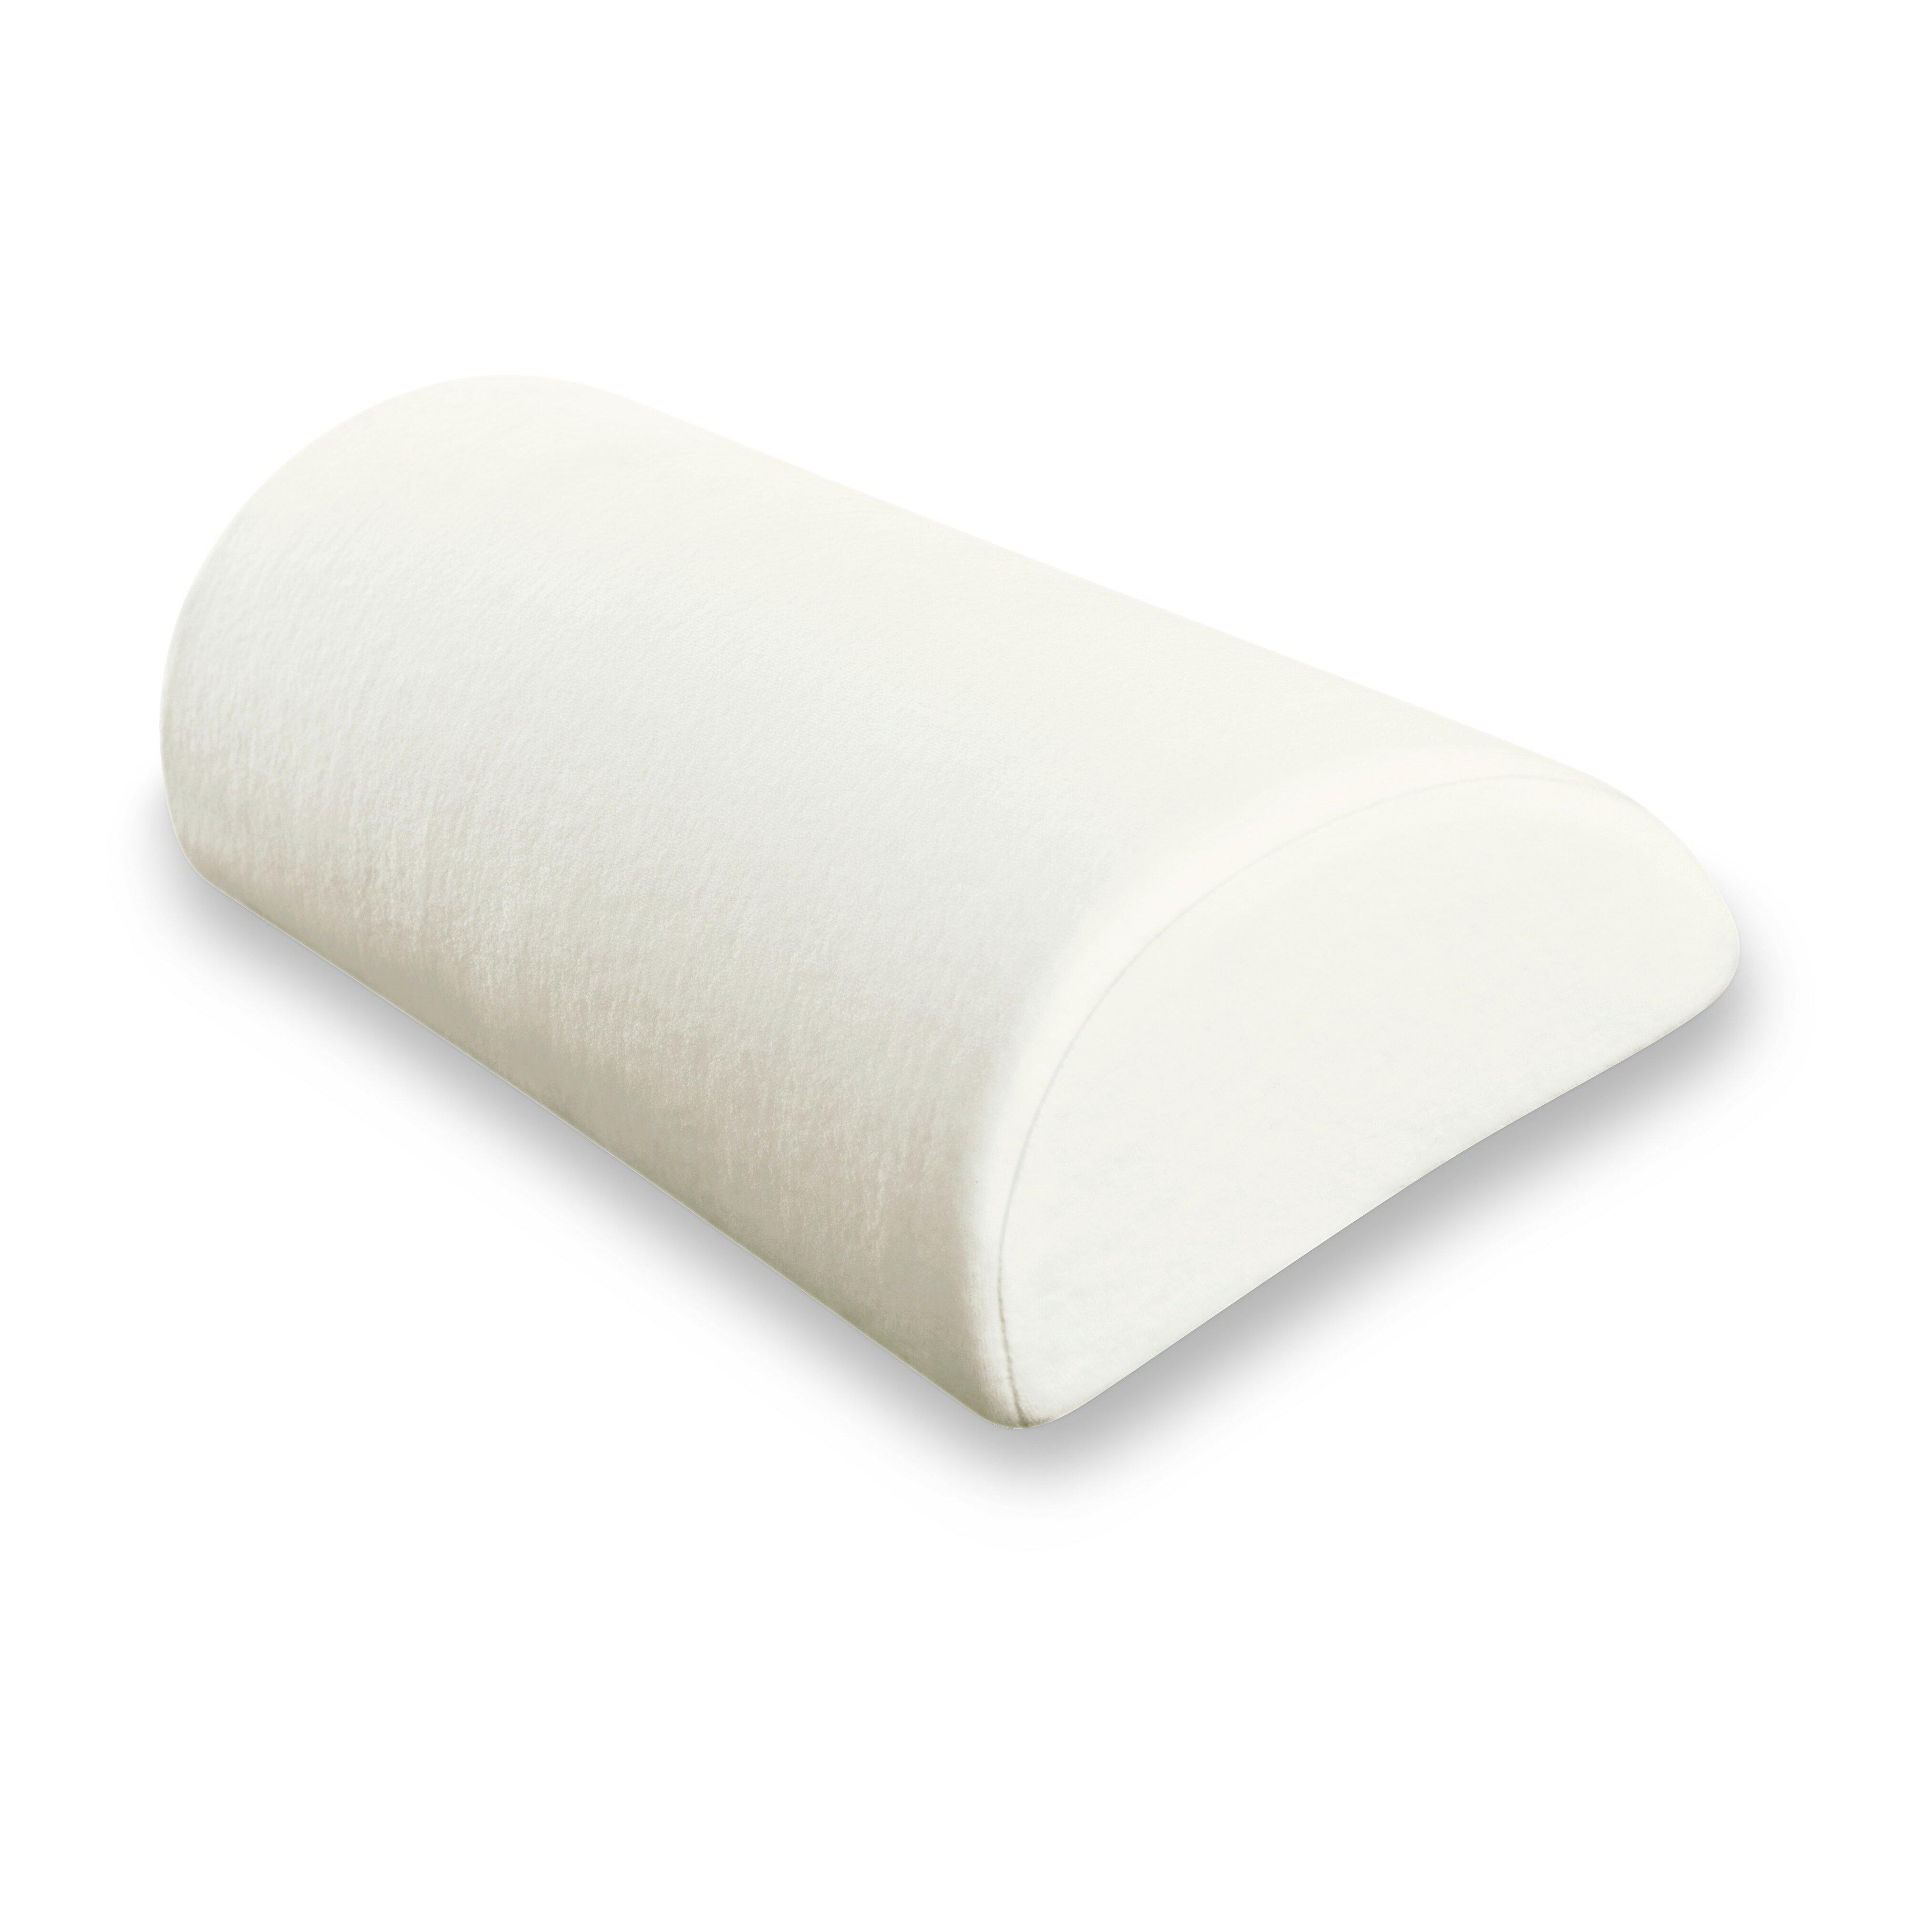 Deluxe comfort half moon pillow reviews wayfair for Bed pillows reviews